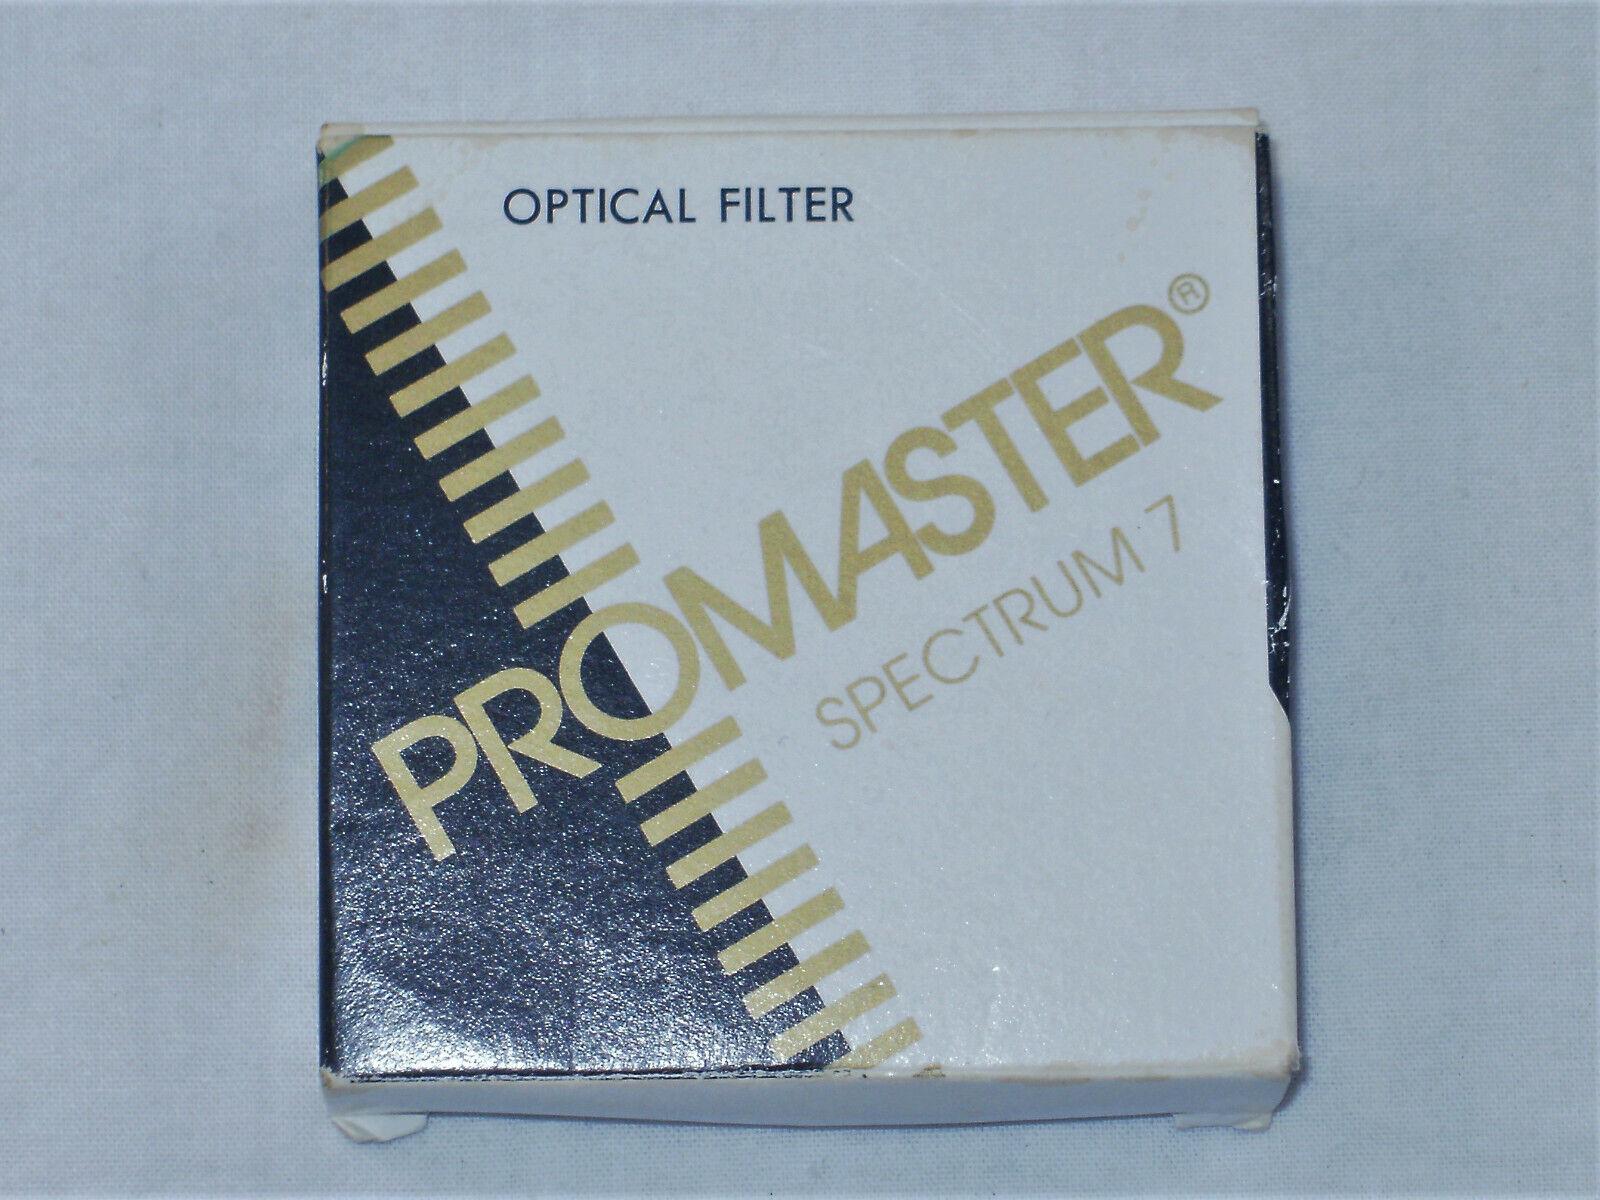 OPTICAL FILTER-PROMASTER SPECTRUM 7- 52MM SKYLIGHT 1A 4101 - $1.95